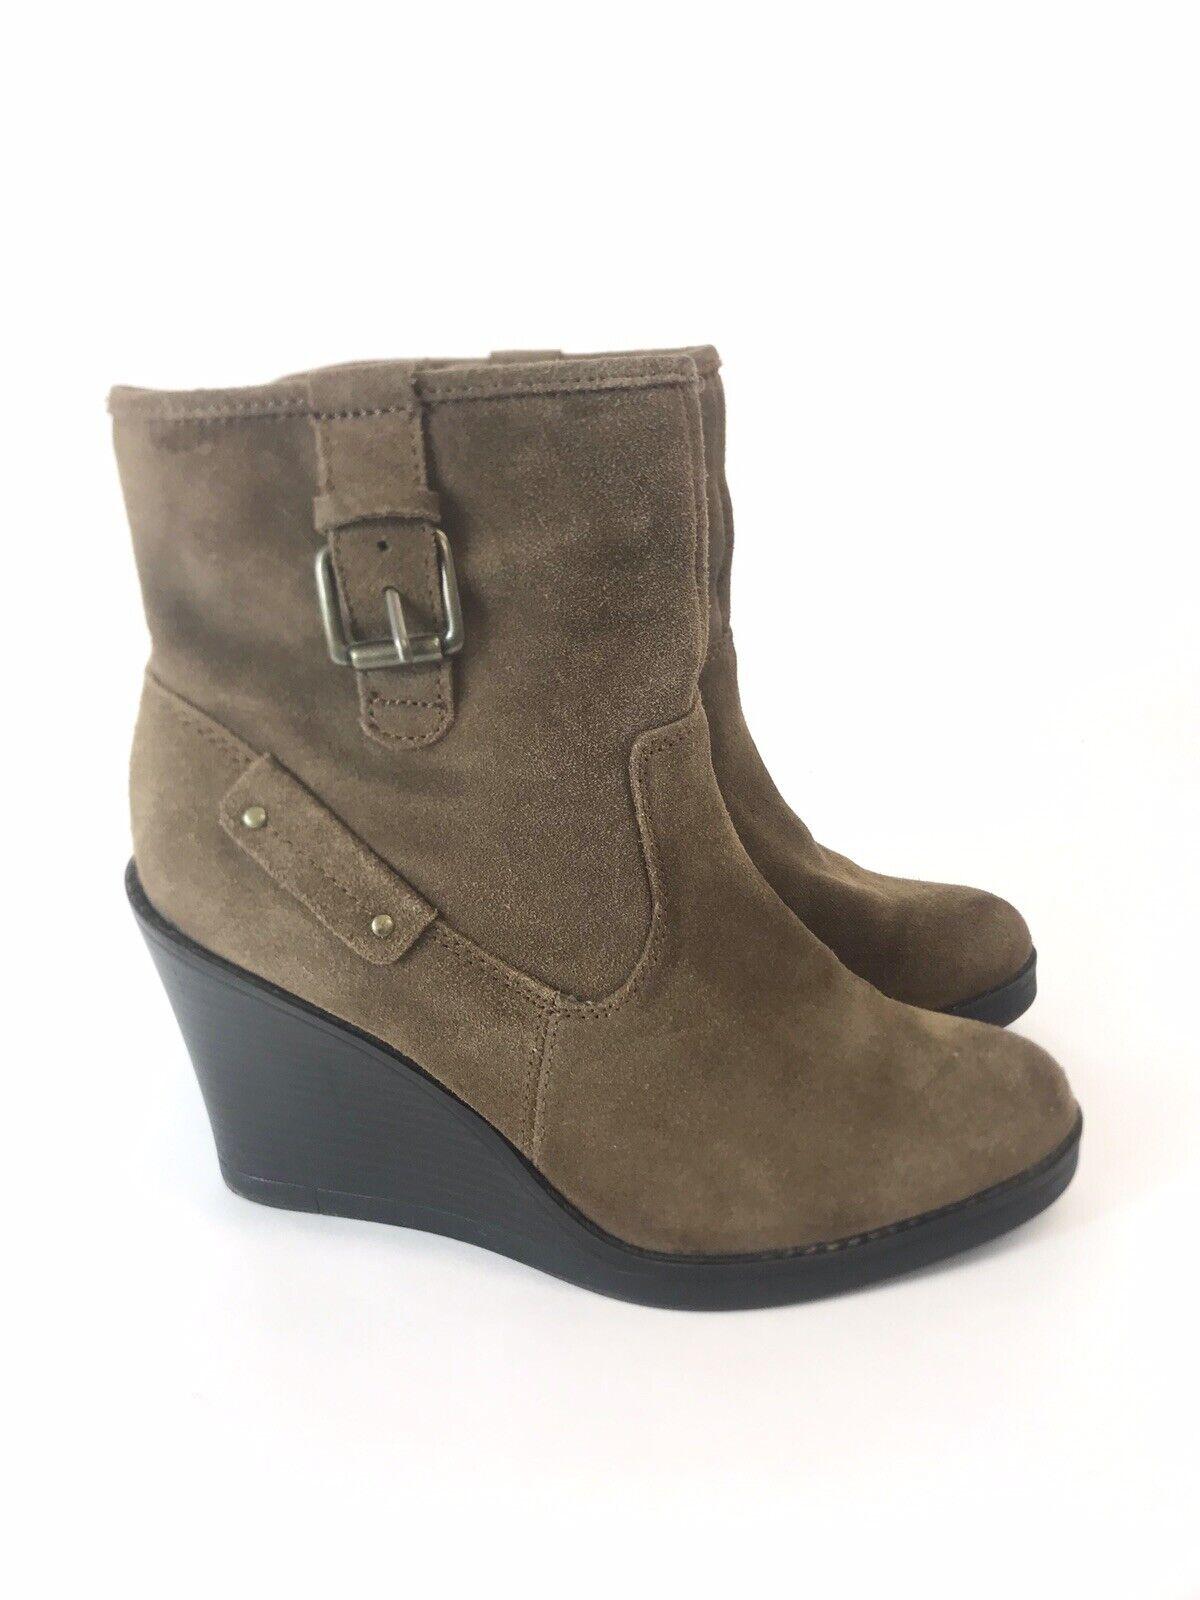 Liz & Co Ladies Brown Suede Leather Ankle Zip Up Wedge Heels Boots US6.5 M UK4.5